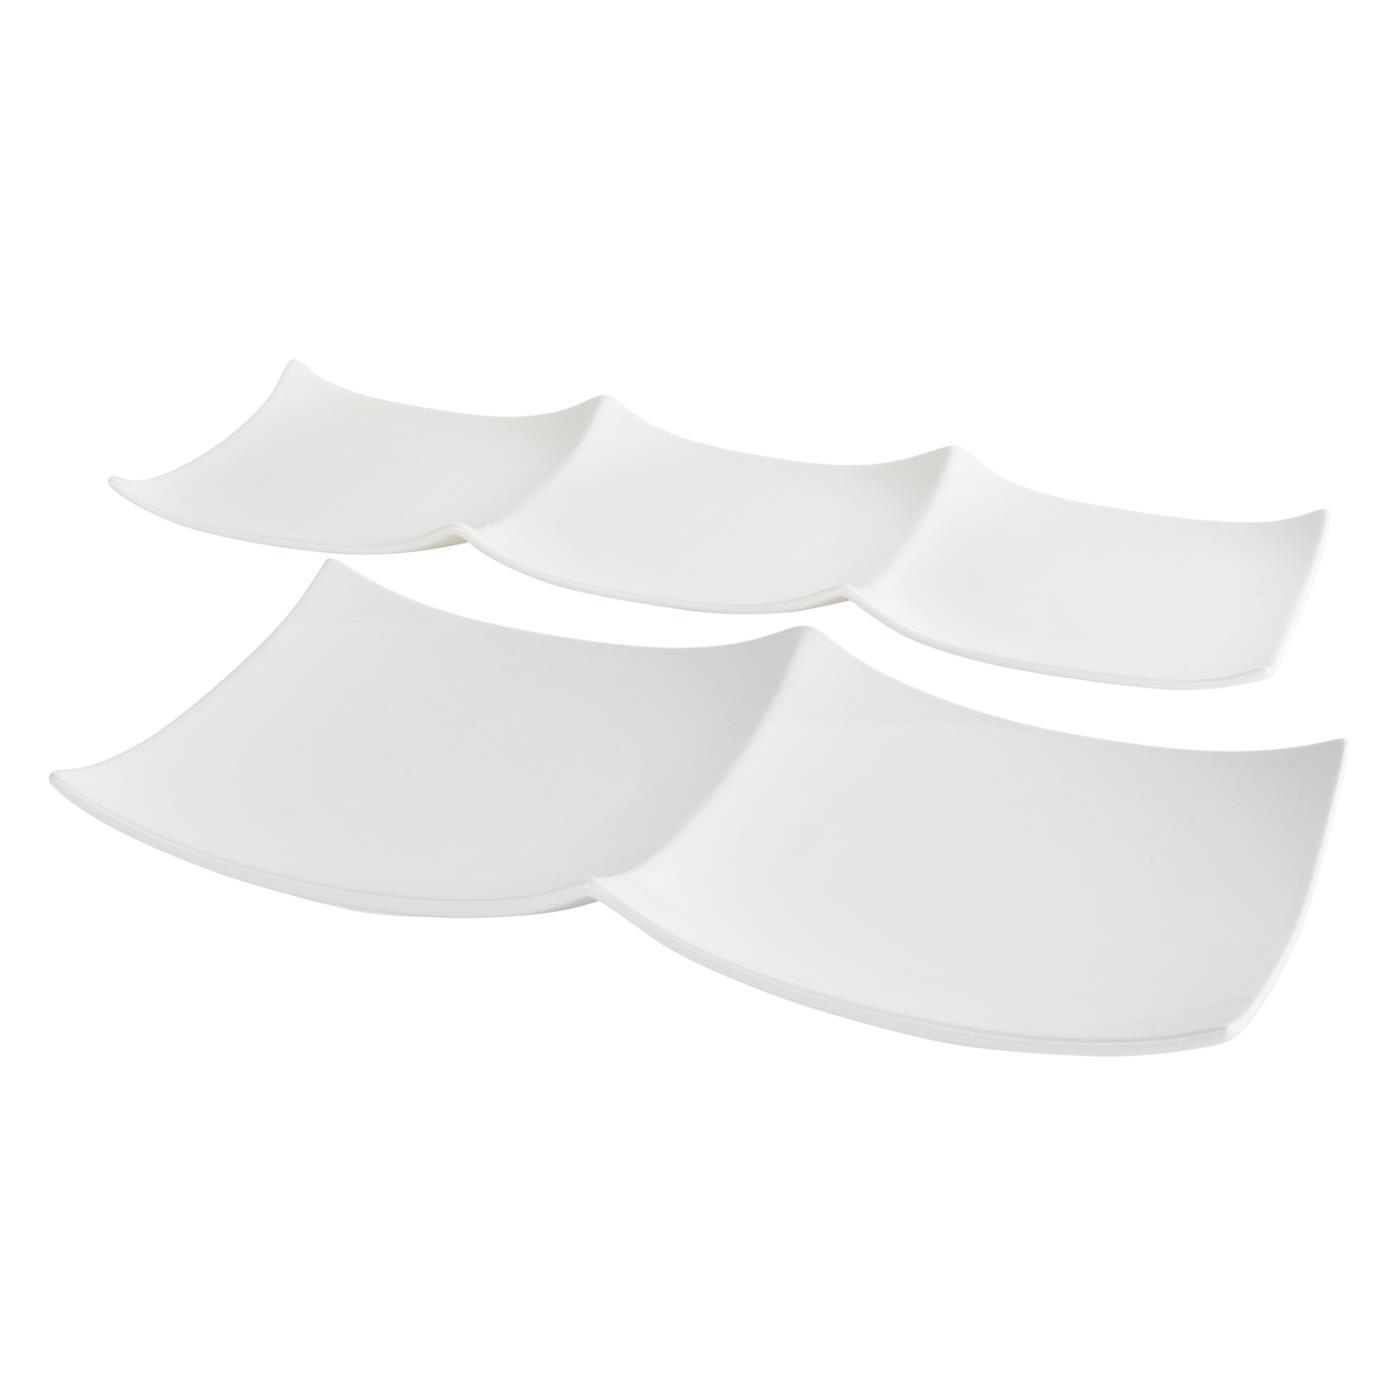 Rectangular Origami Plate